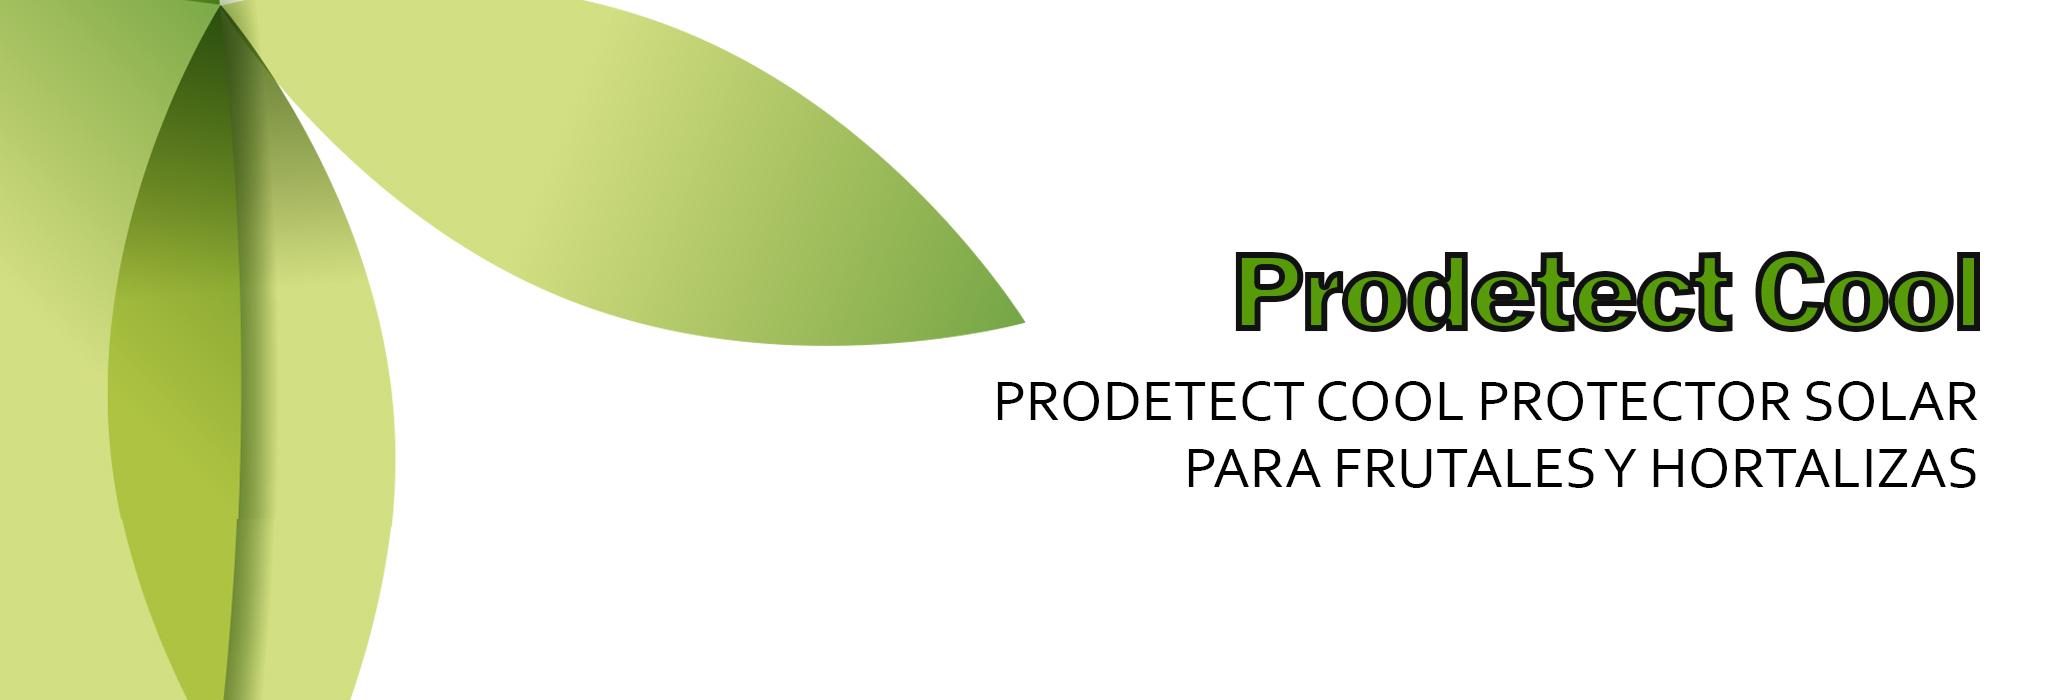 Prodetect Cool long